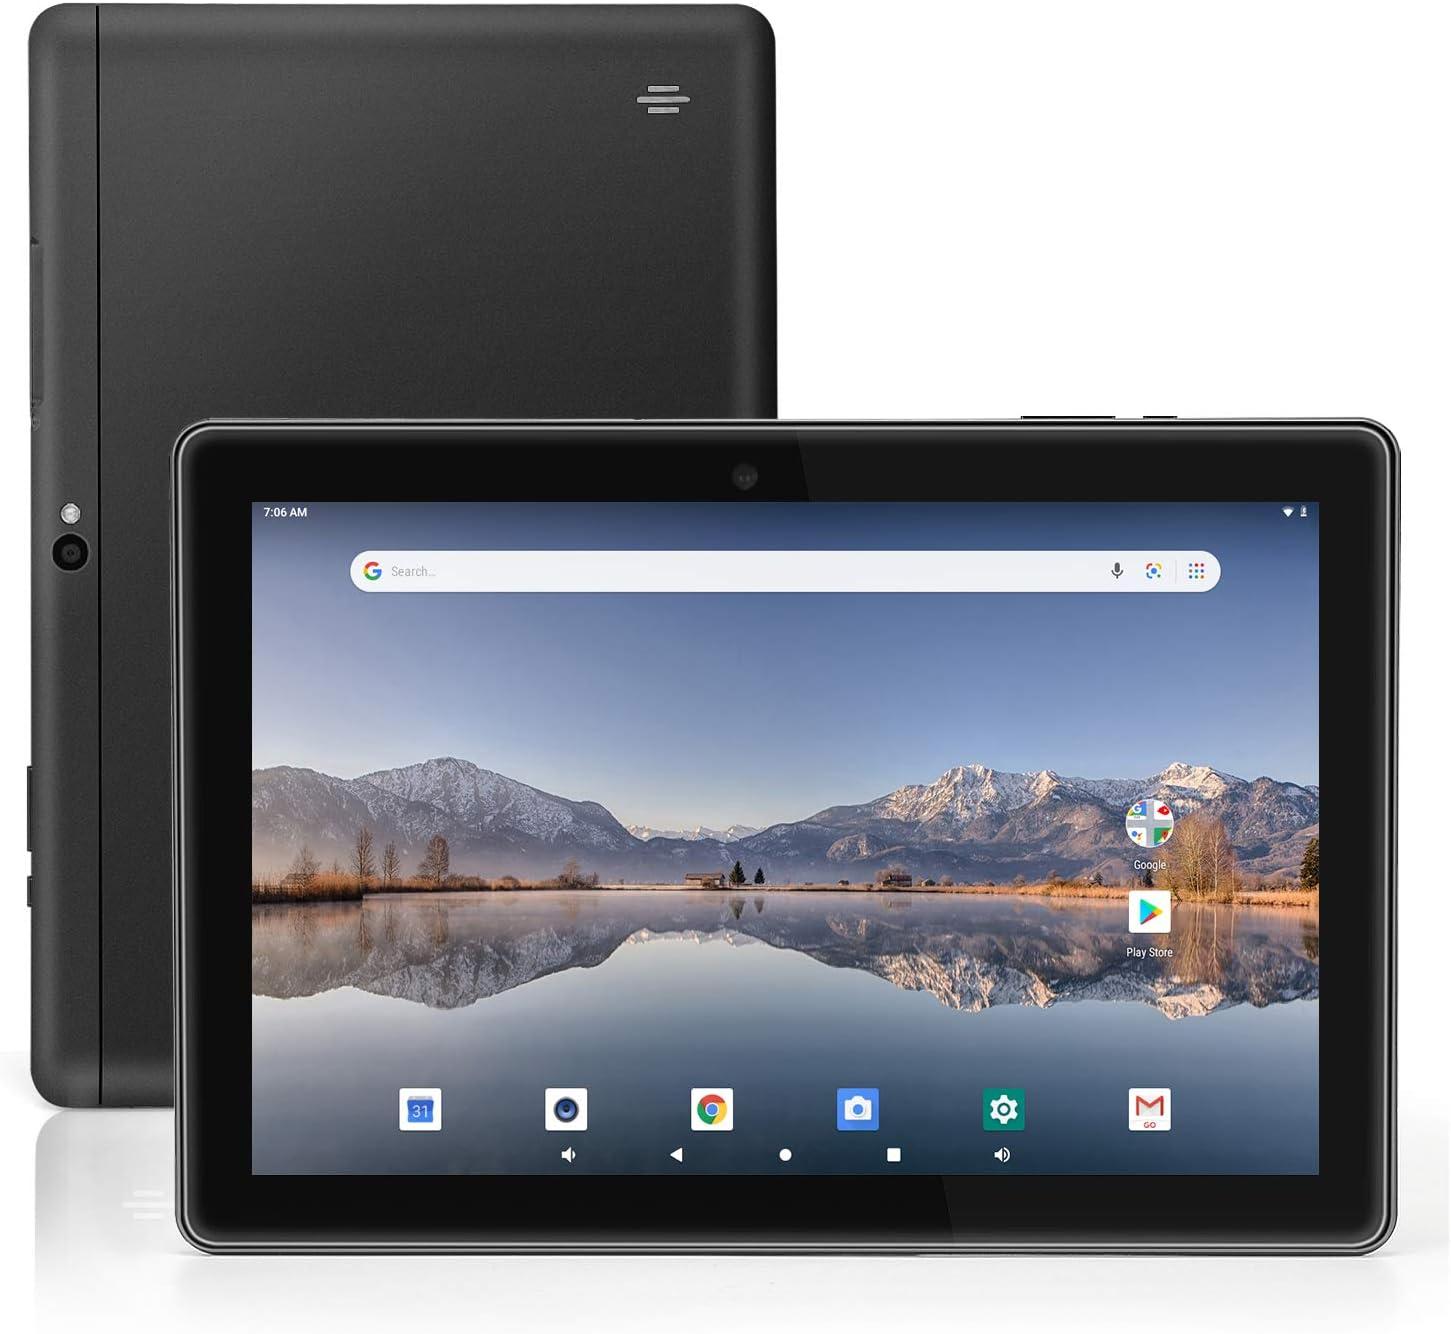 Tablet 10 inch Android 9.0 Pie OS, 4 GB RAM 64 GB Storage, 5MP Rear Camera, Quad-Core Processor, 10.1 inch IPS HD Display, Wi-Fi